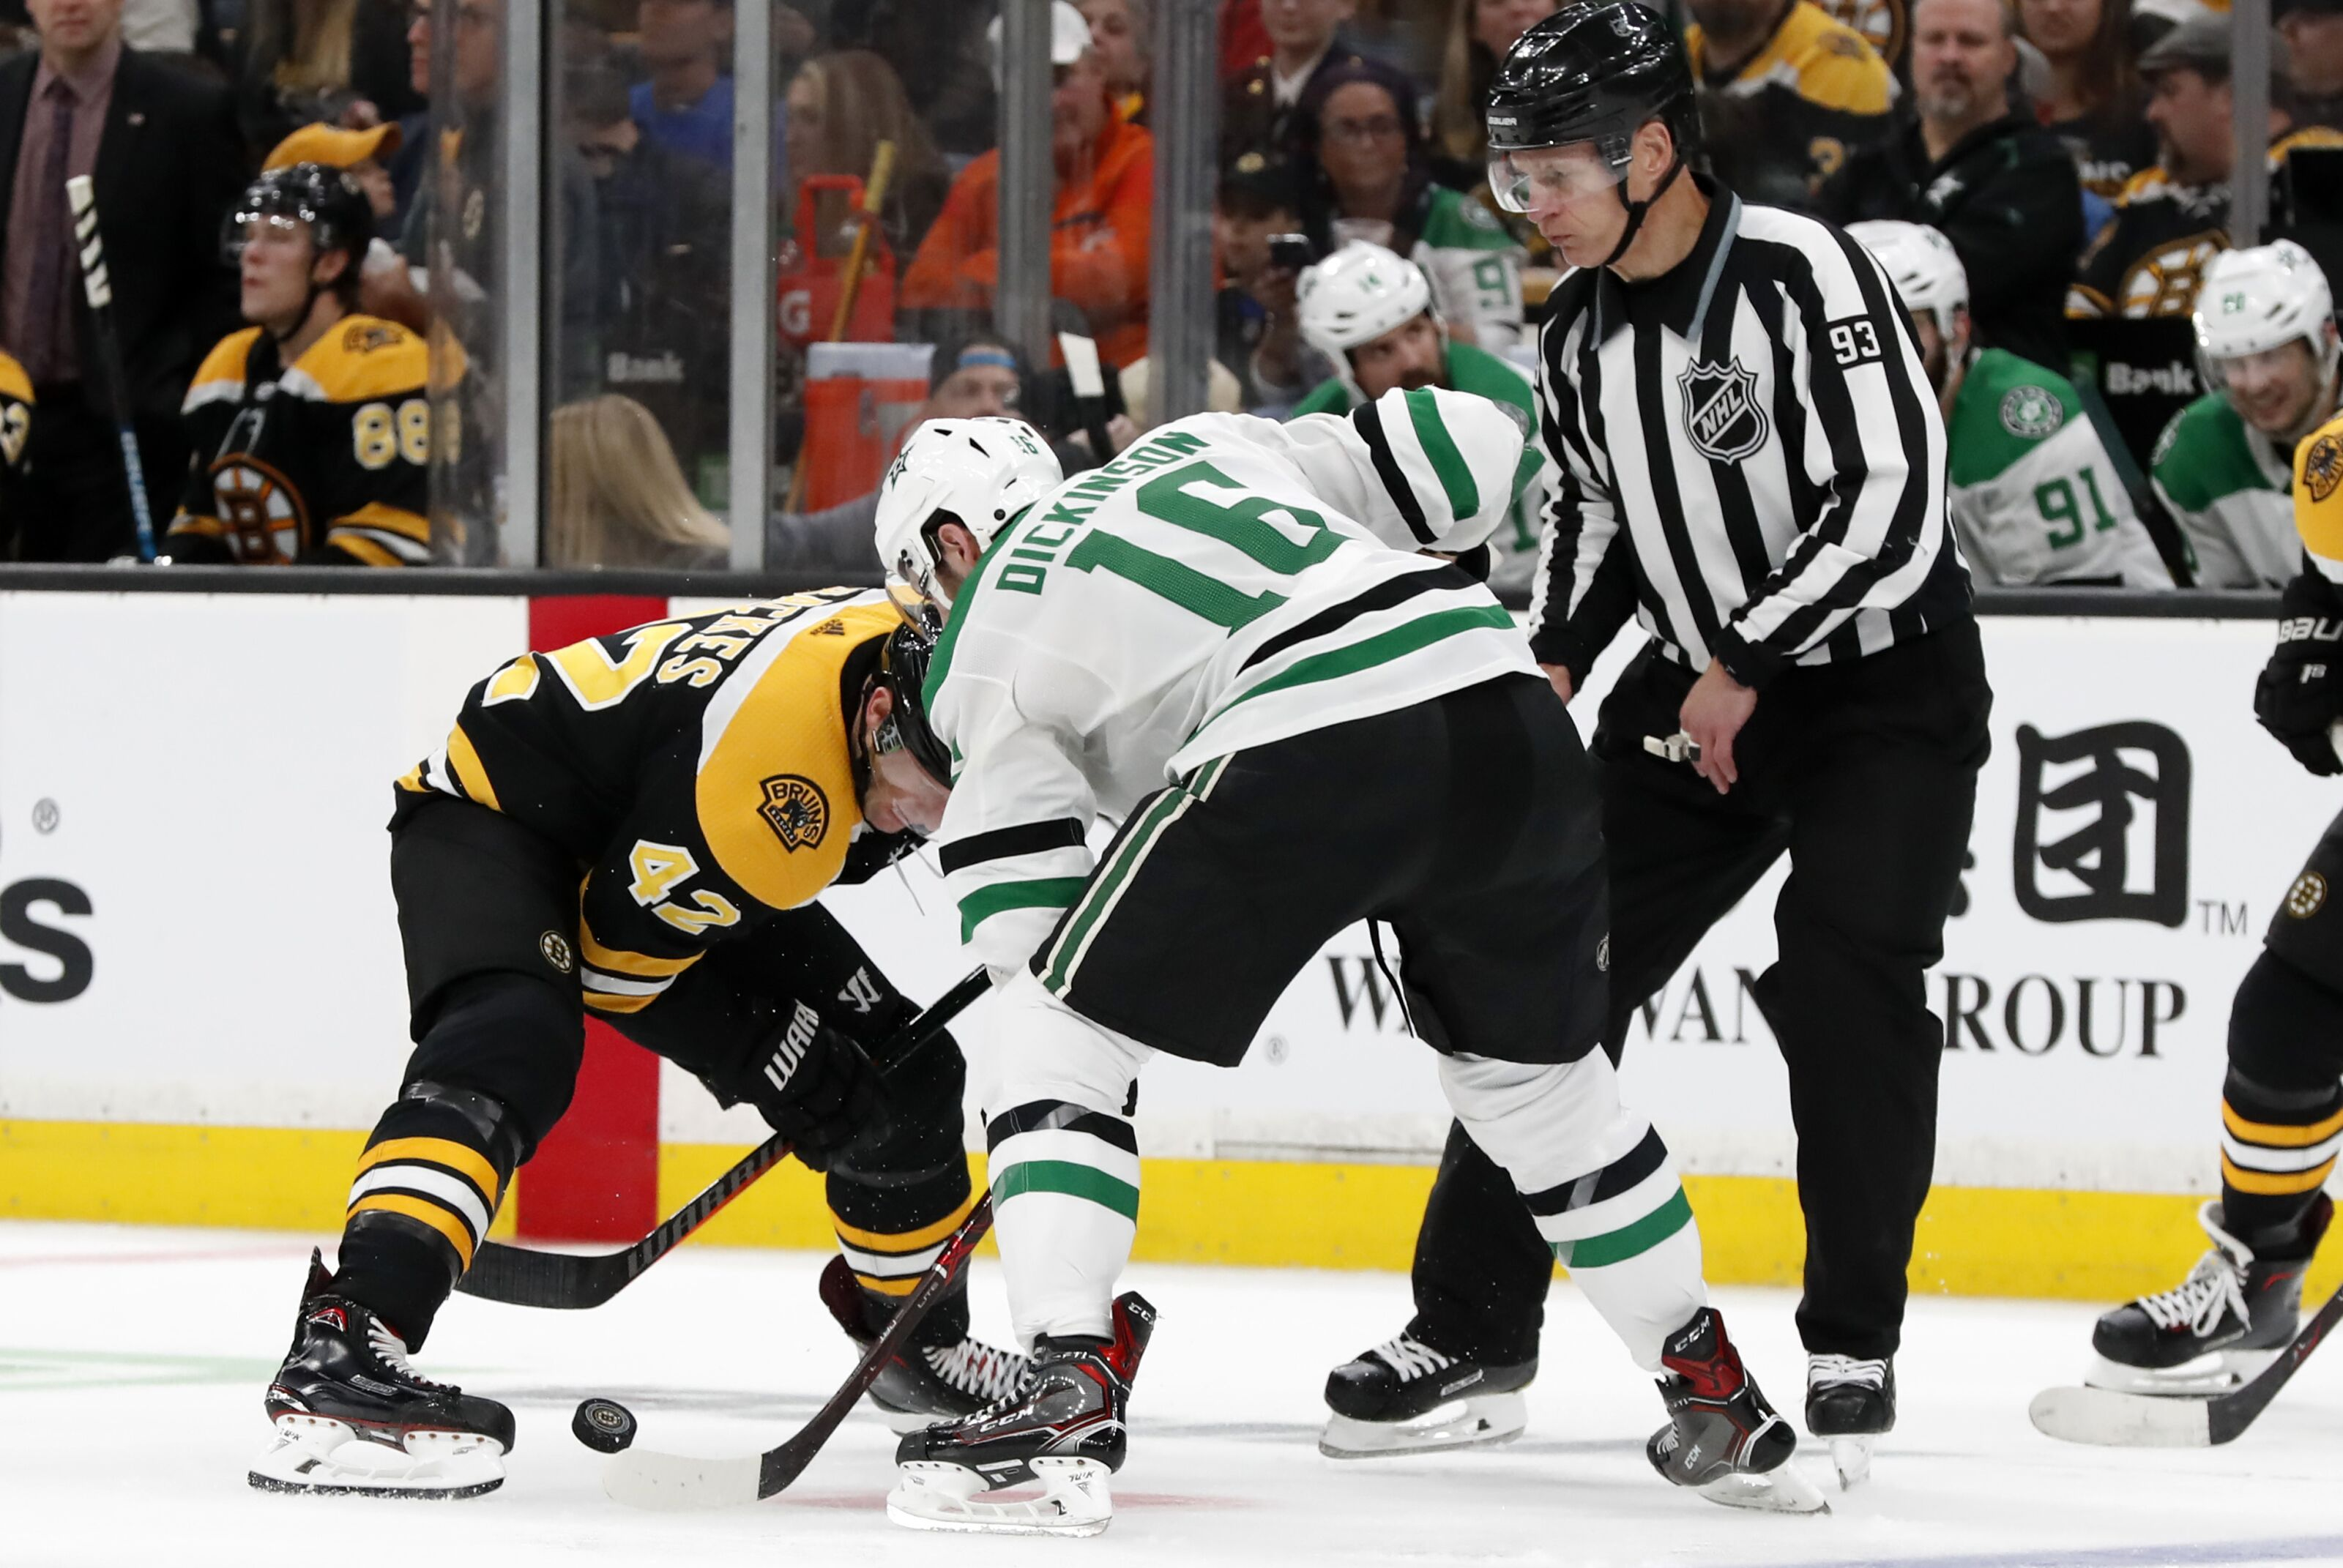 Dallas Stars vs. Boston Bruins: Game Info, Broadcast, Lines, Injuries